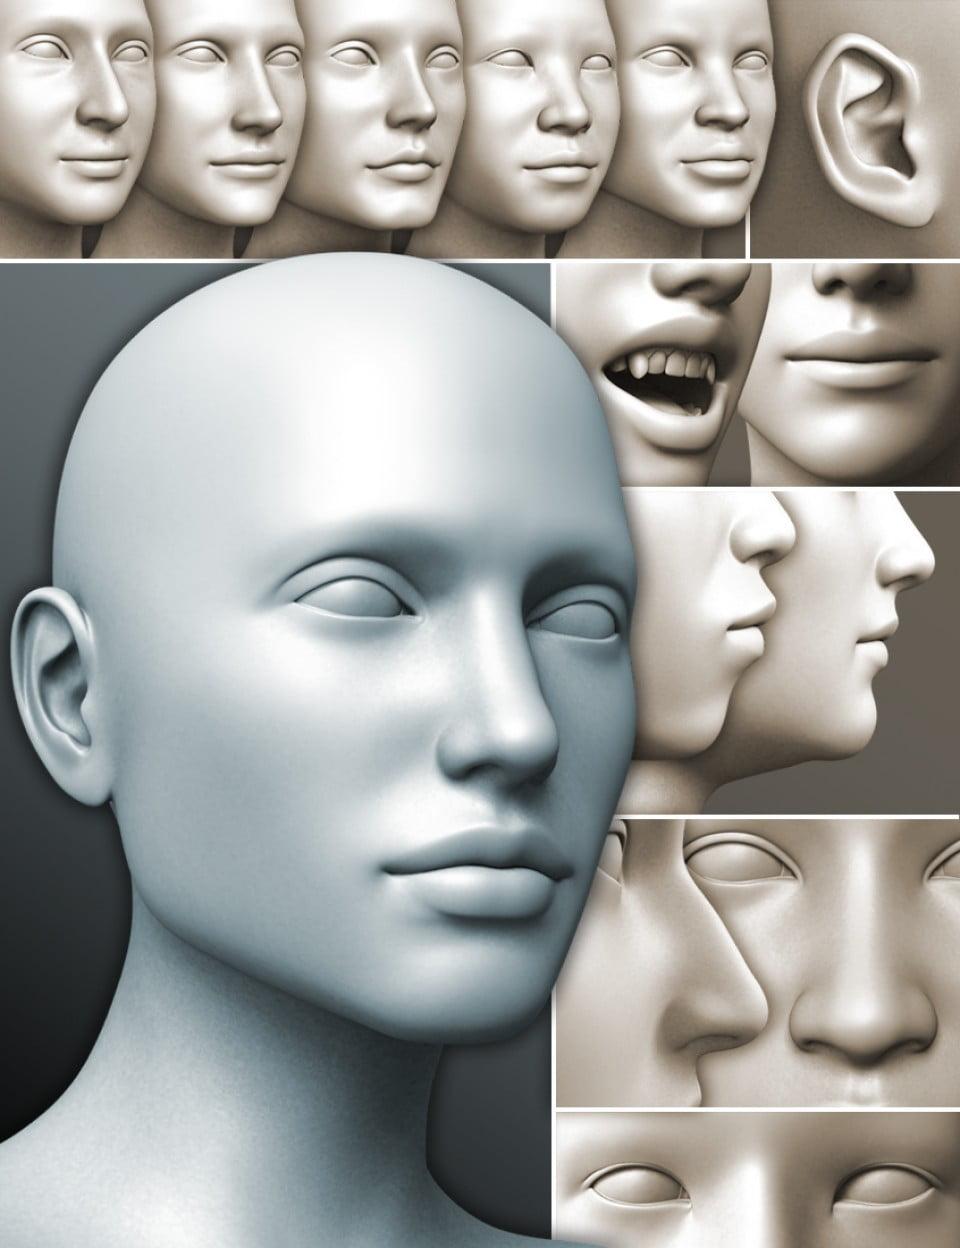 200 Plus - Head & Face Morphs for Genesis 3 Female(s)